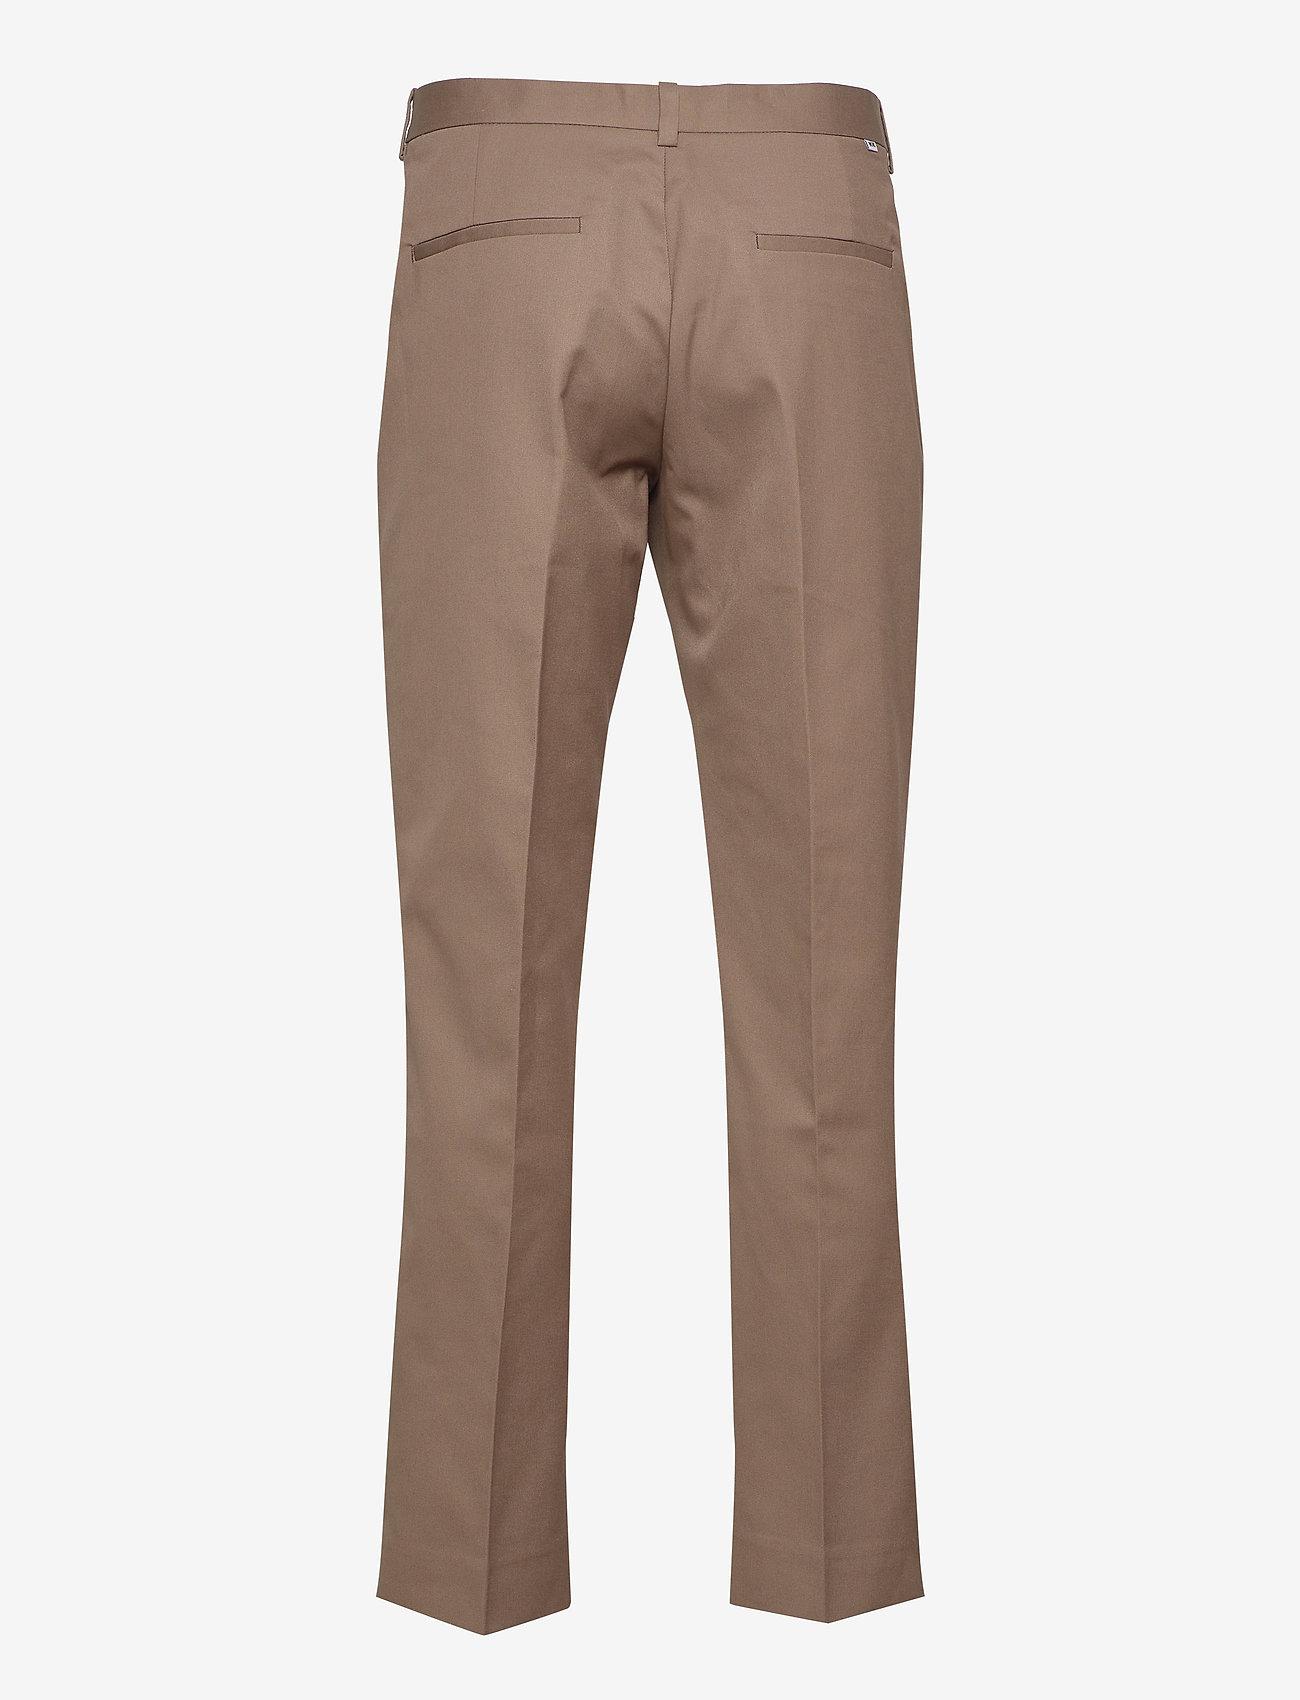 Wood Wood Tristan trousers - Bukser TAUPE - Menn Klær